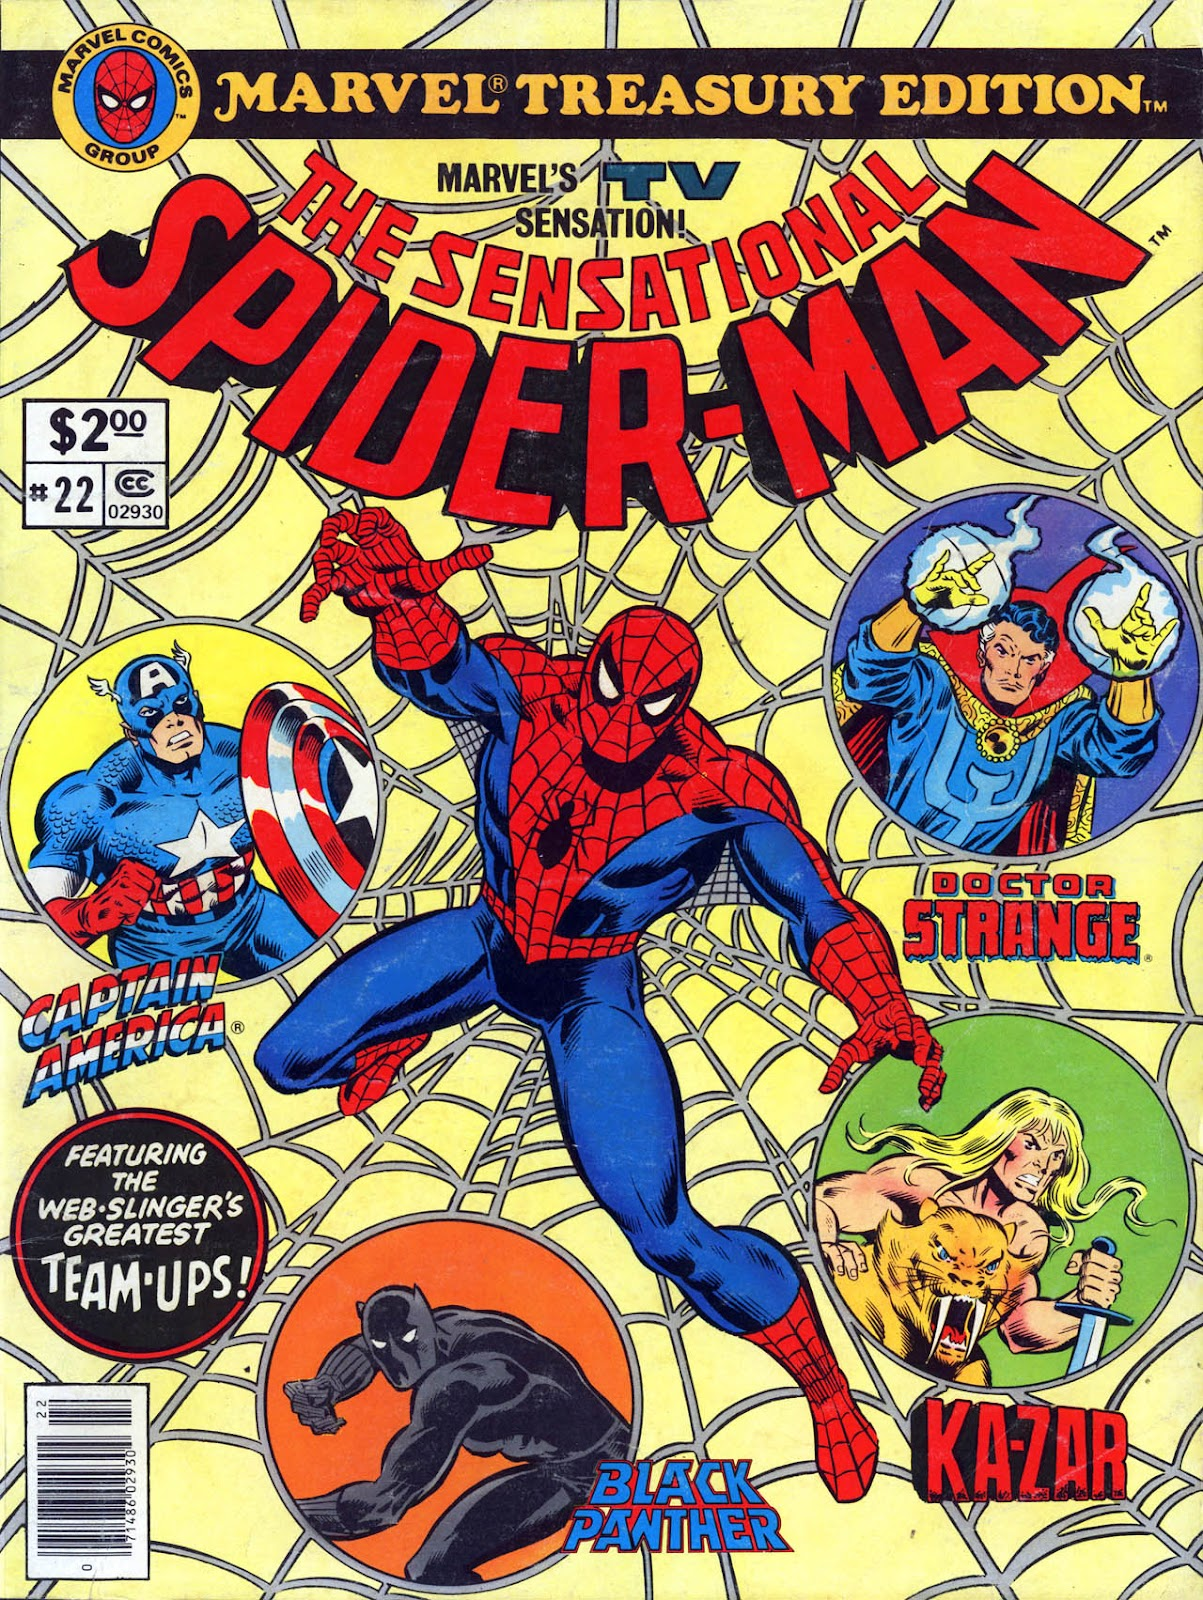 Marvel Treasury Edition 22 Page 1